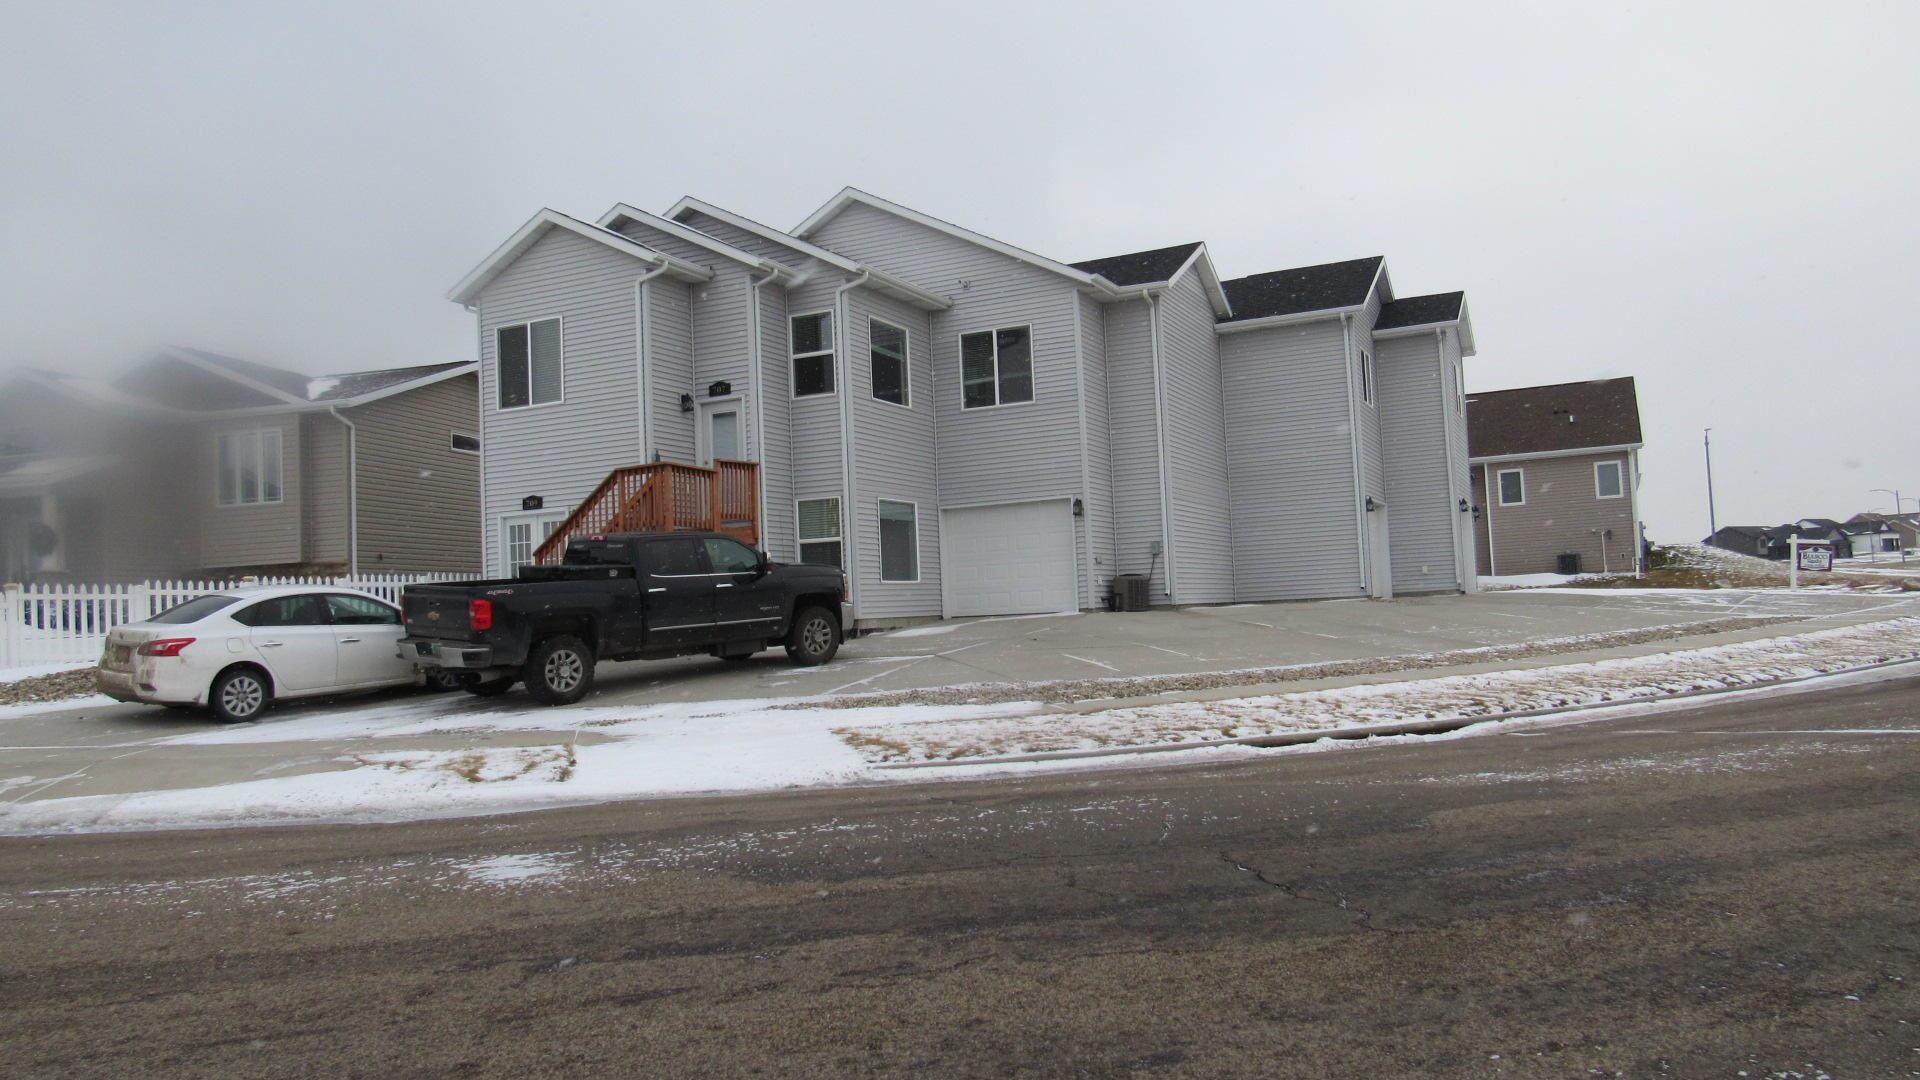 709 Lasalle Drive E, Bismarck, ND 58503 - #: 408559